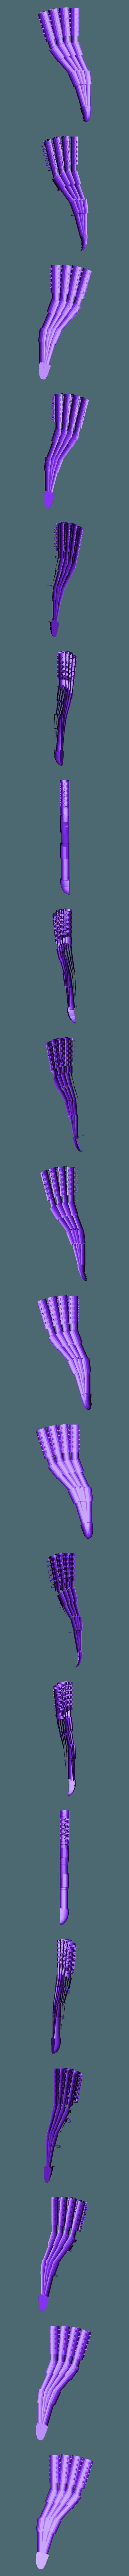 Quad_Long_Side_L.stl Download free STL file Gaslands Greebles (Blowers and Burners) • Design to 3D print, Ellie_Valkyrie